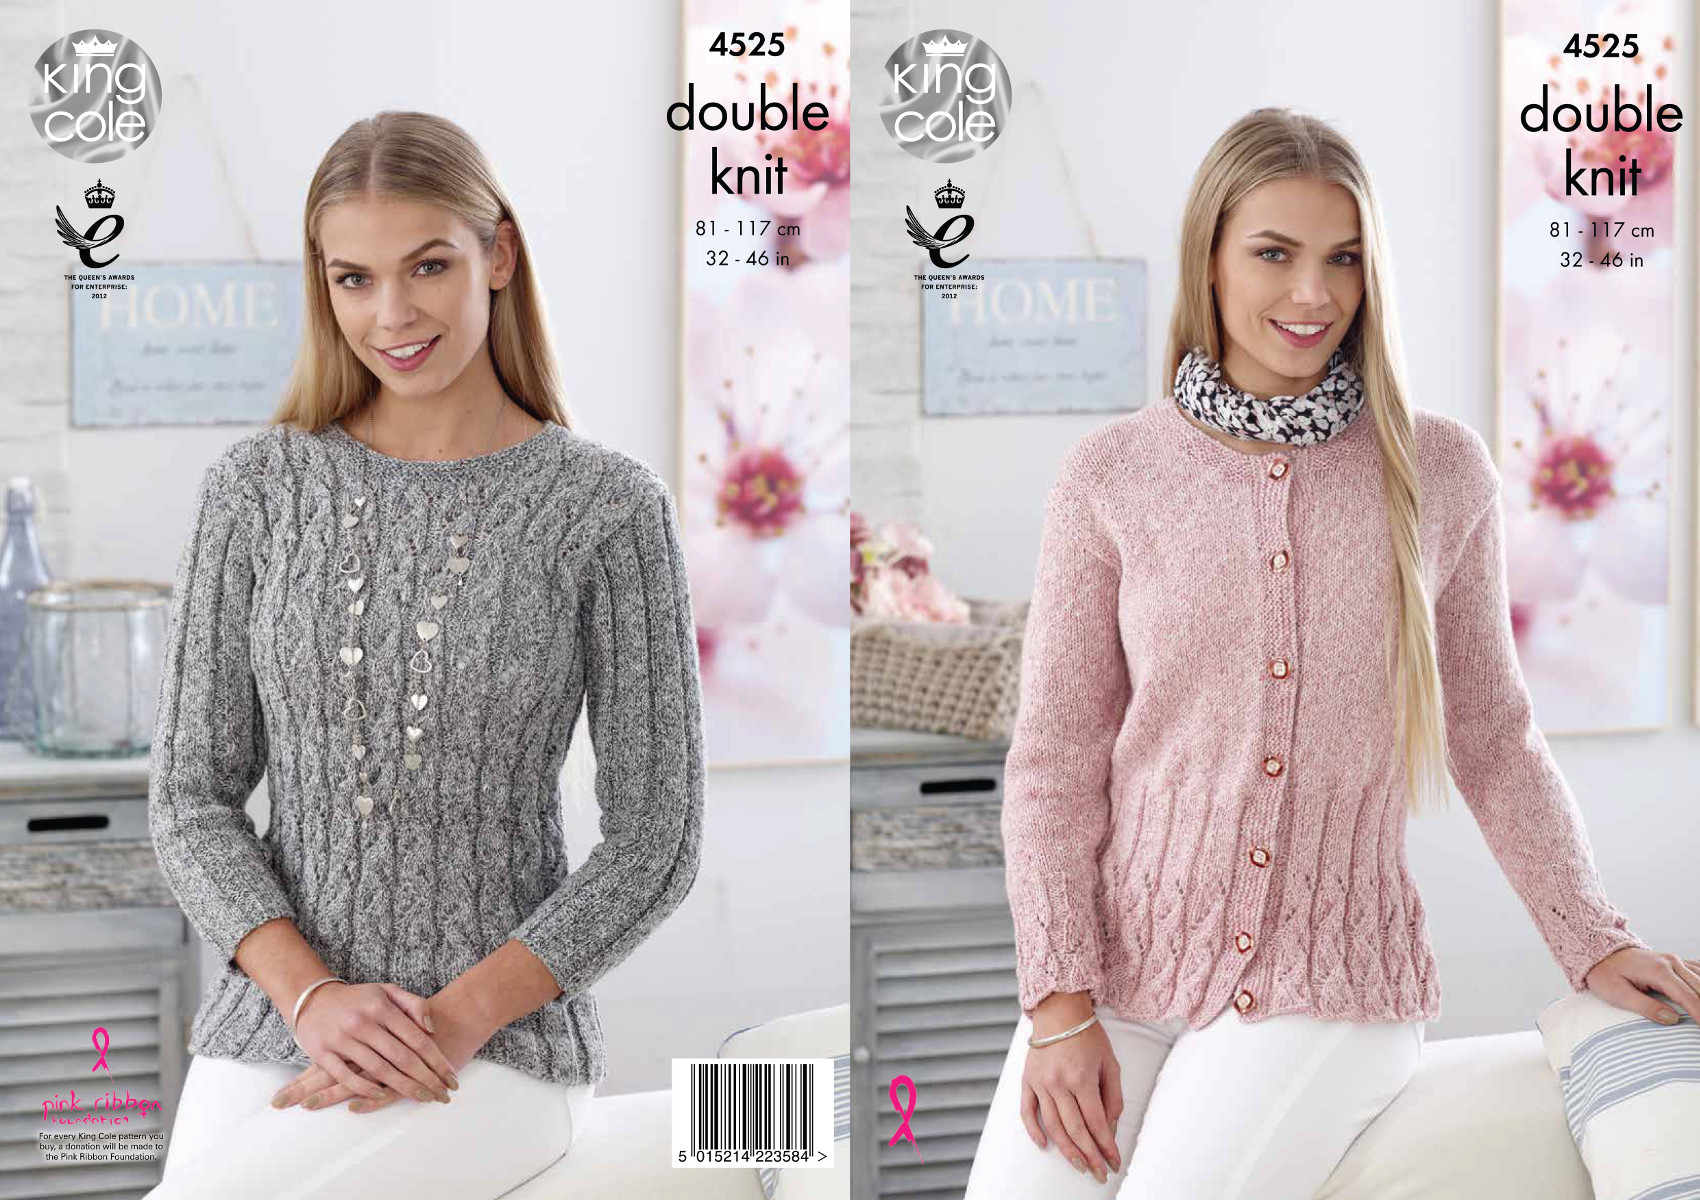 3b87ccf4b6b4 Ladies Lacy Cardigan   Sweater Knitting Pattern King Cole Authentic DK 4525